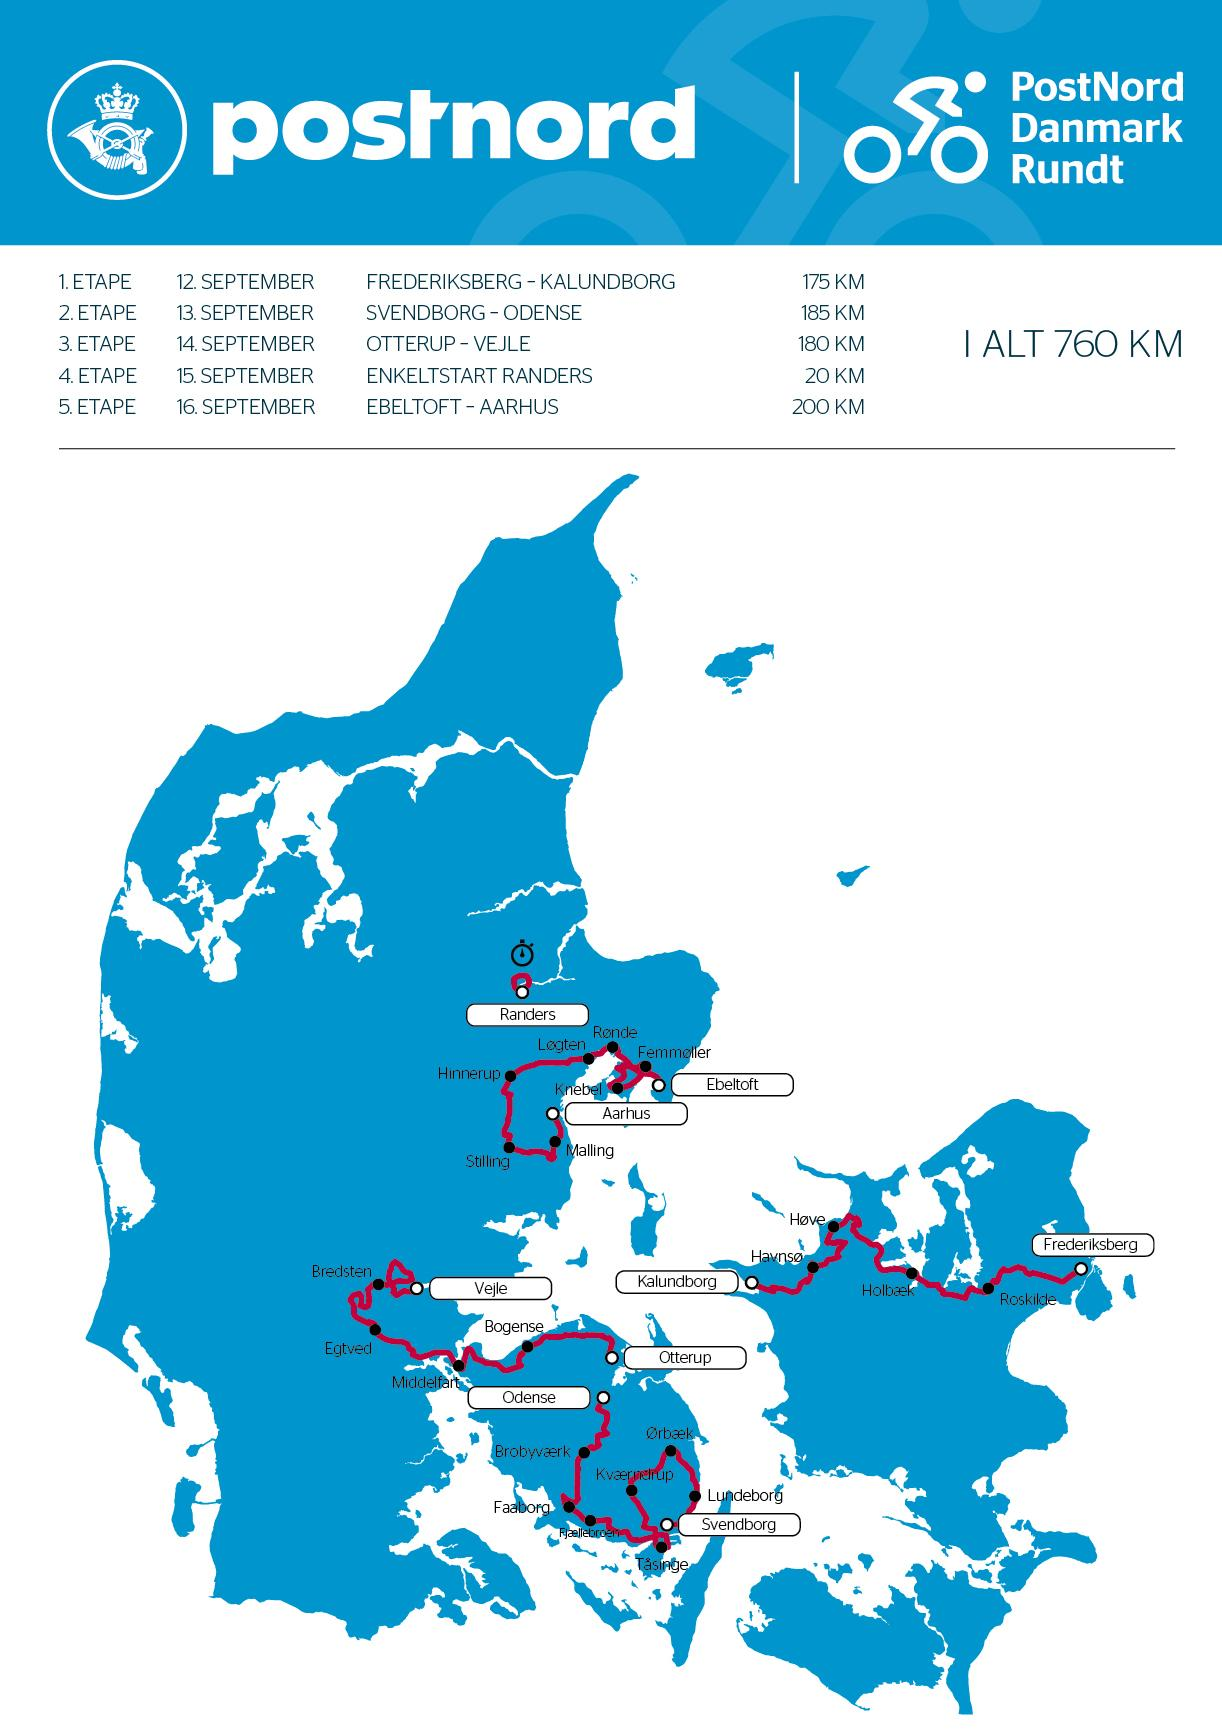 postnord-danmark-rundt-etapeoversigt-2017.jpg